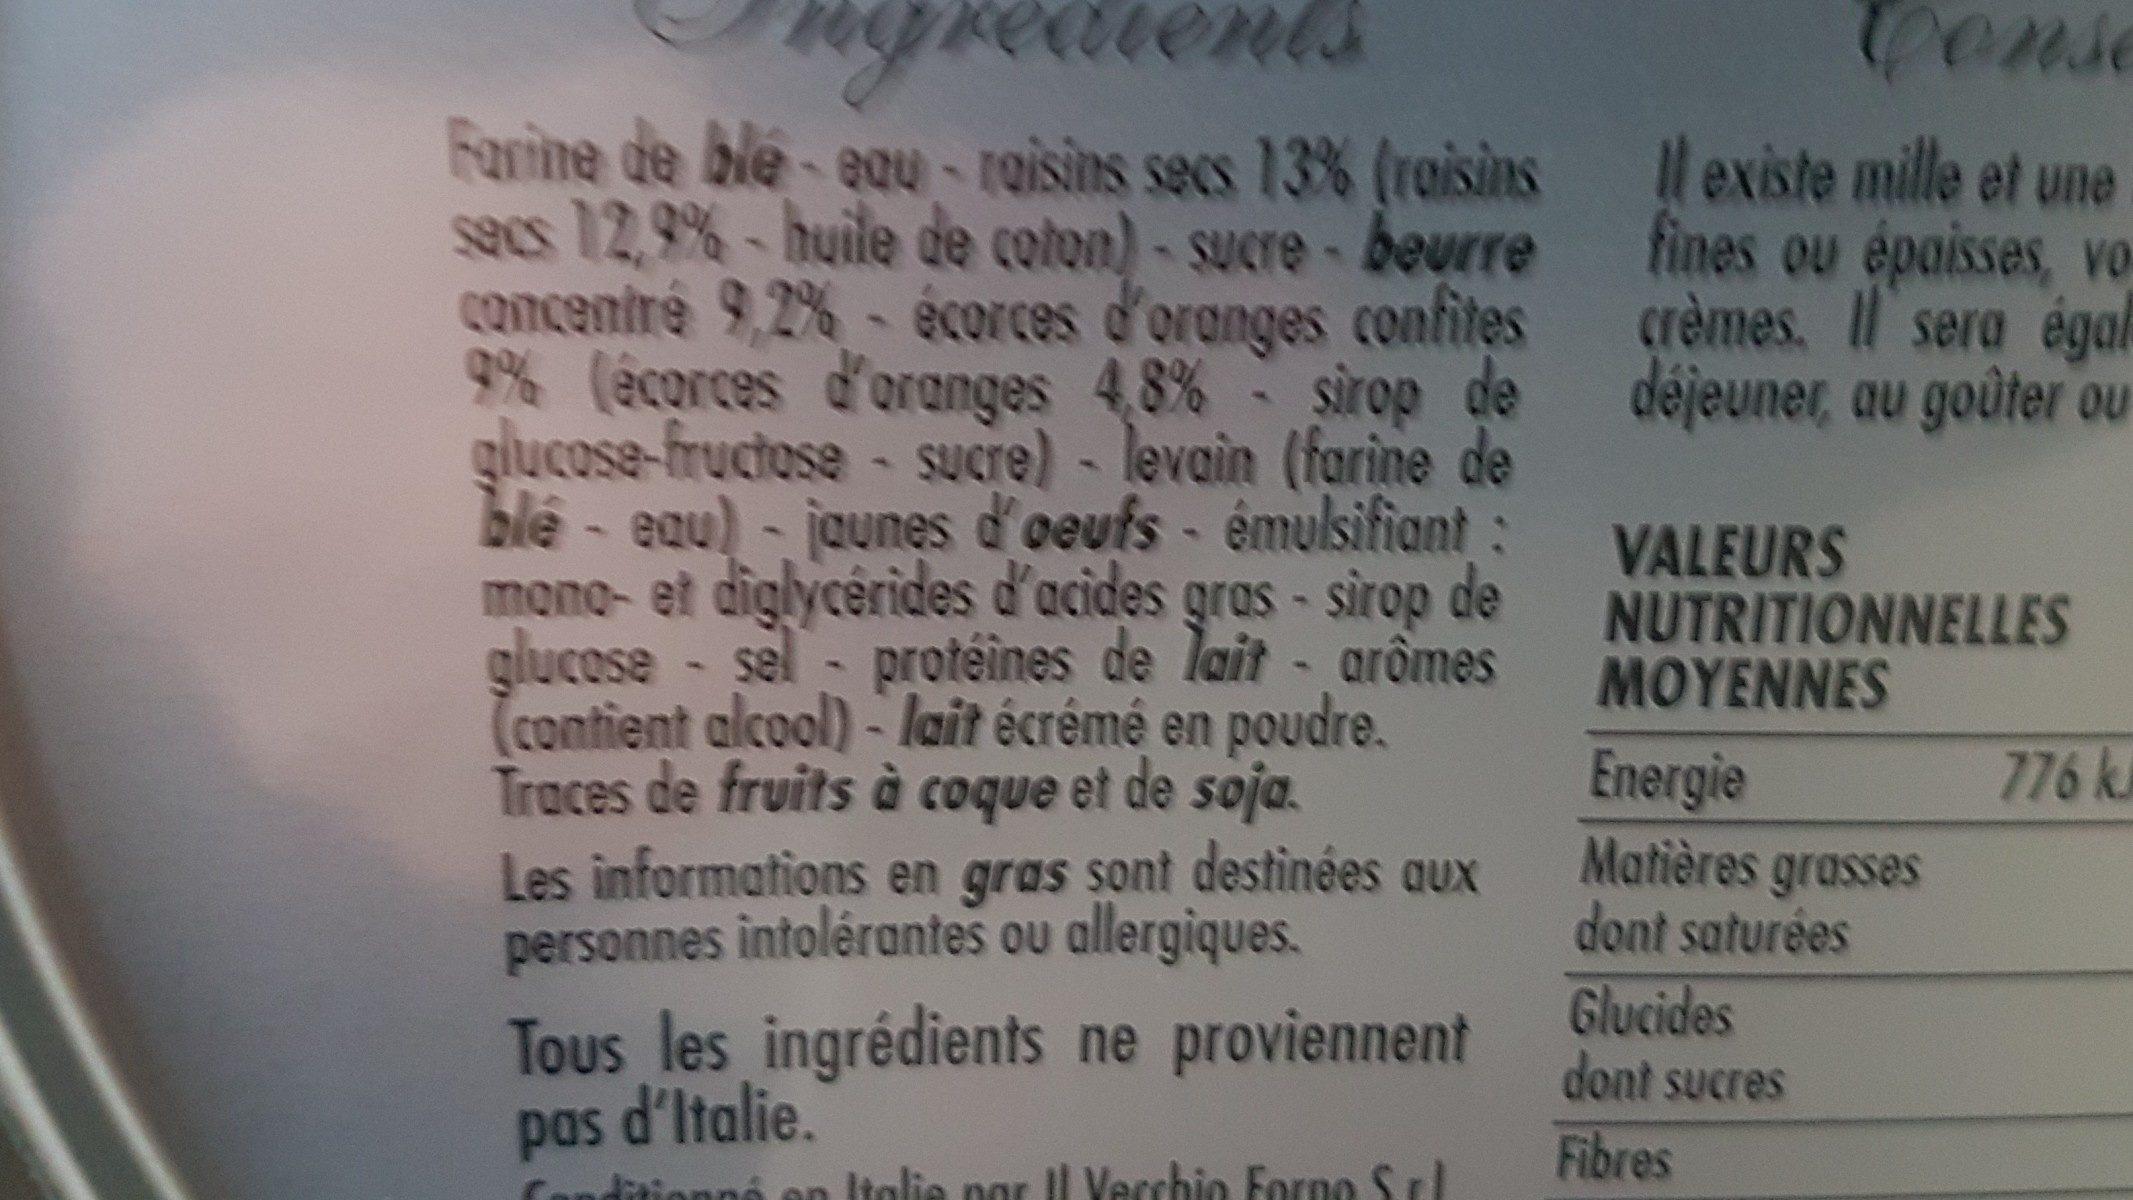 Panettone pur beurre festif boite métal - Ingrediënten - fr